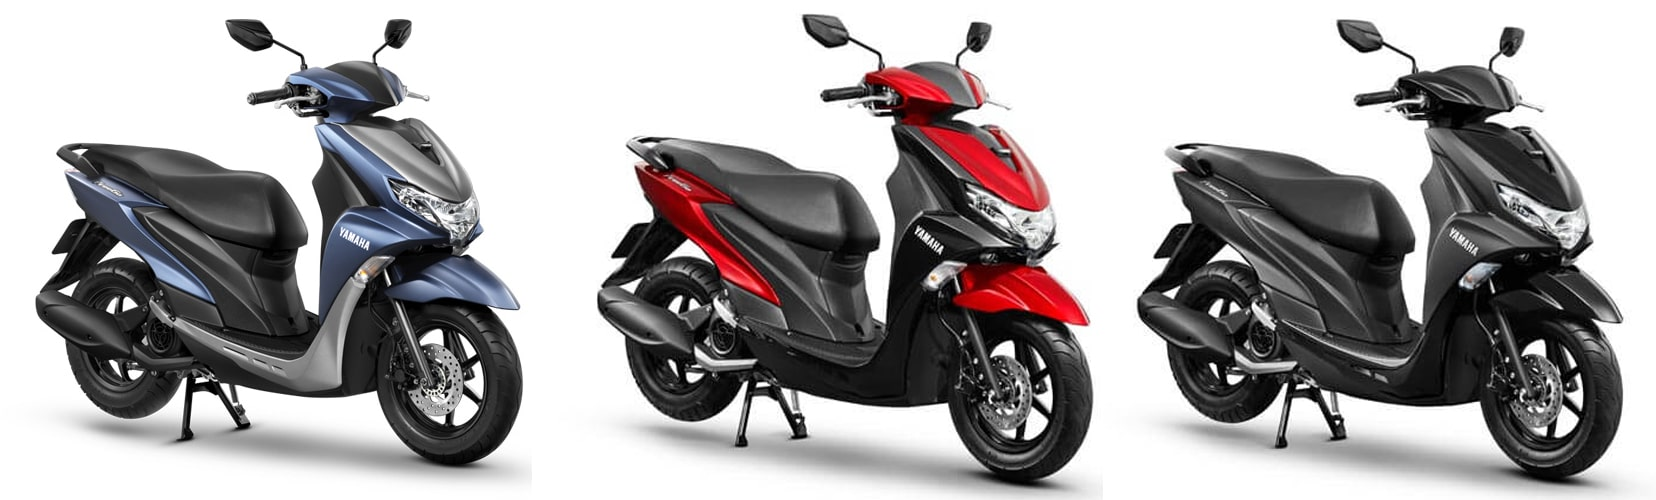 Yamaha Freego 2020 สีน้ำเงิน, สีแดง-ดำและสีดำ